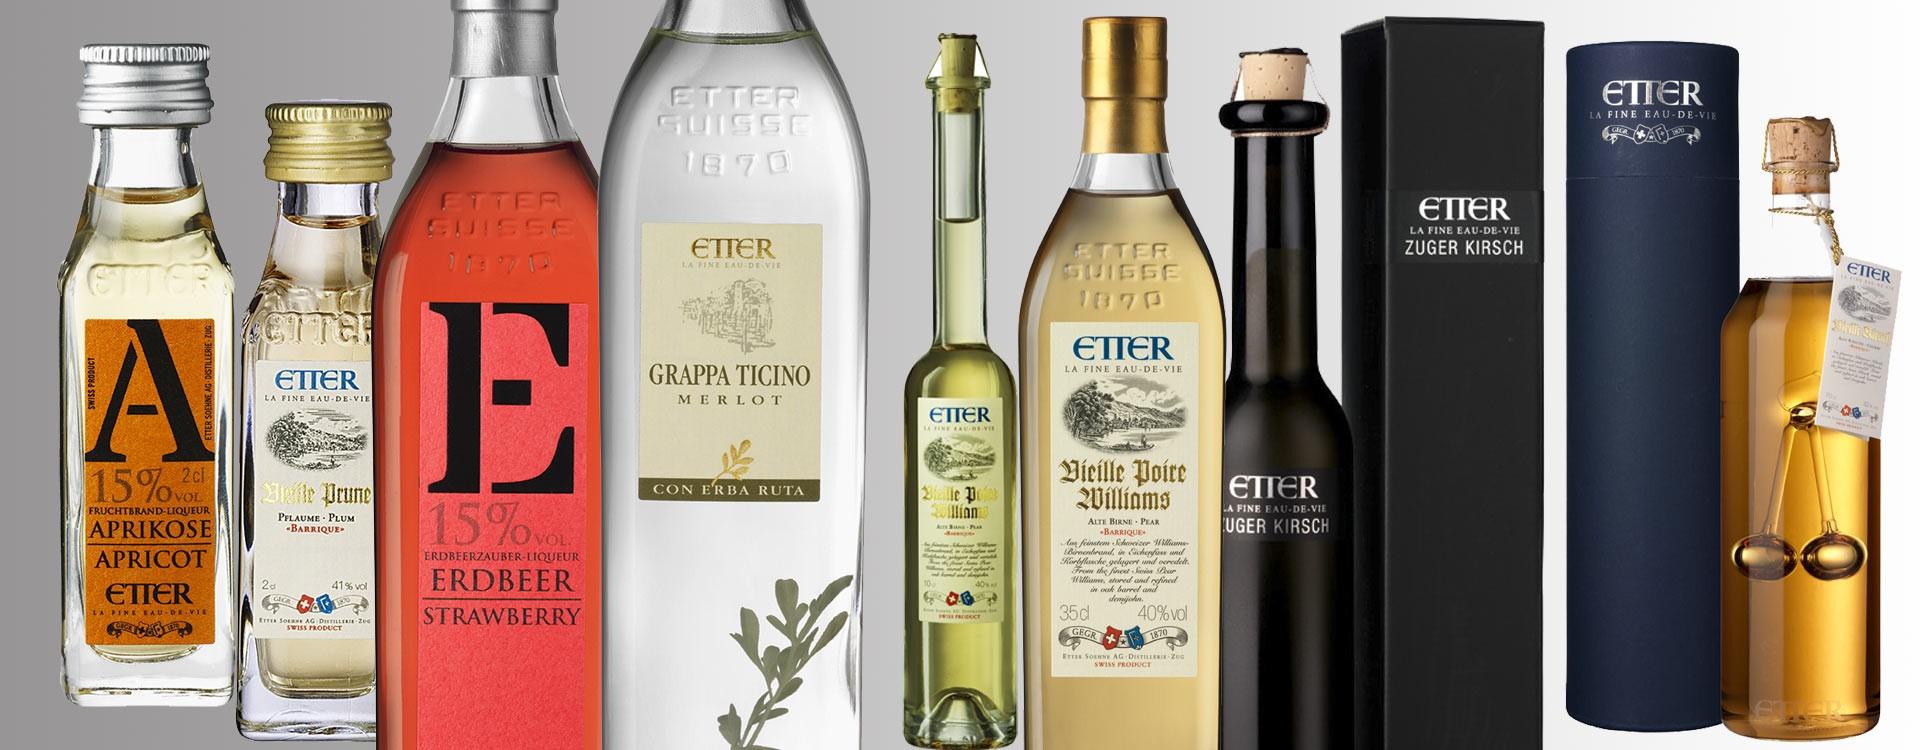 Fruit Brandies and Liquors Etter from Switzerland